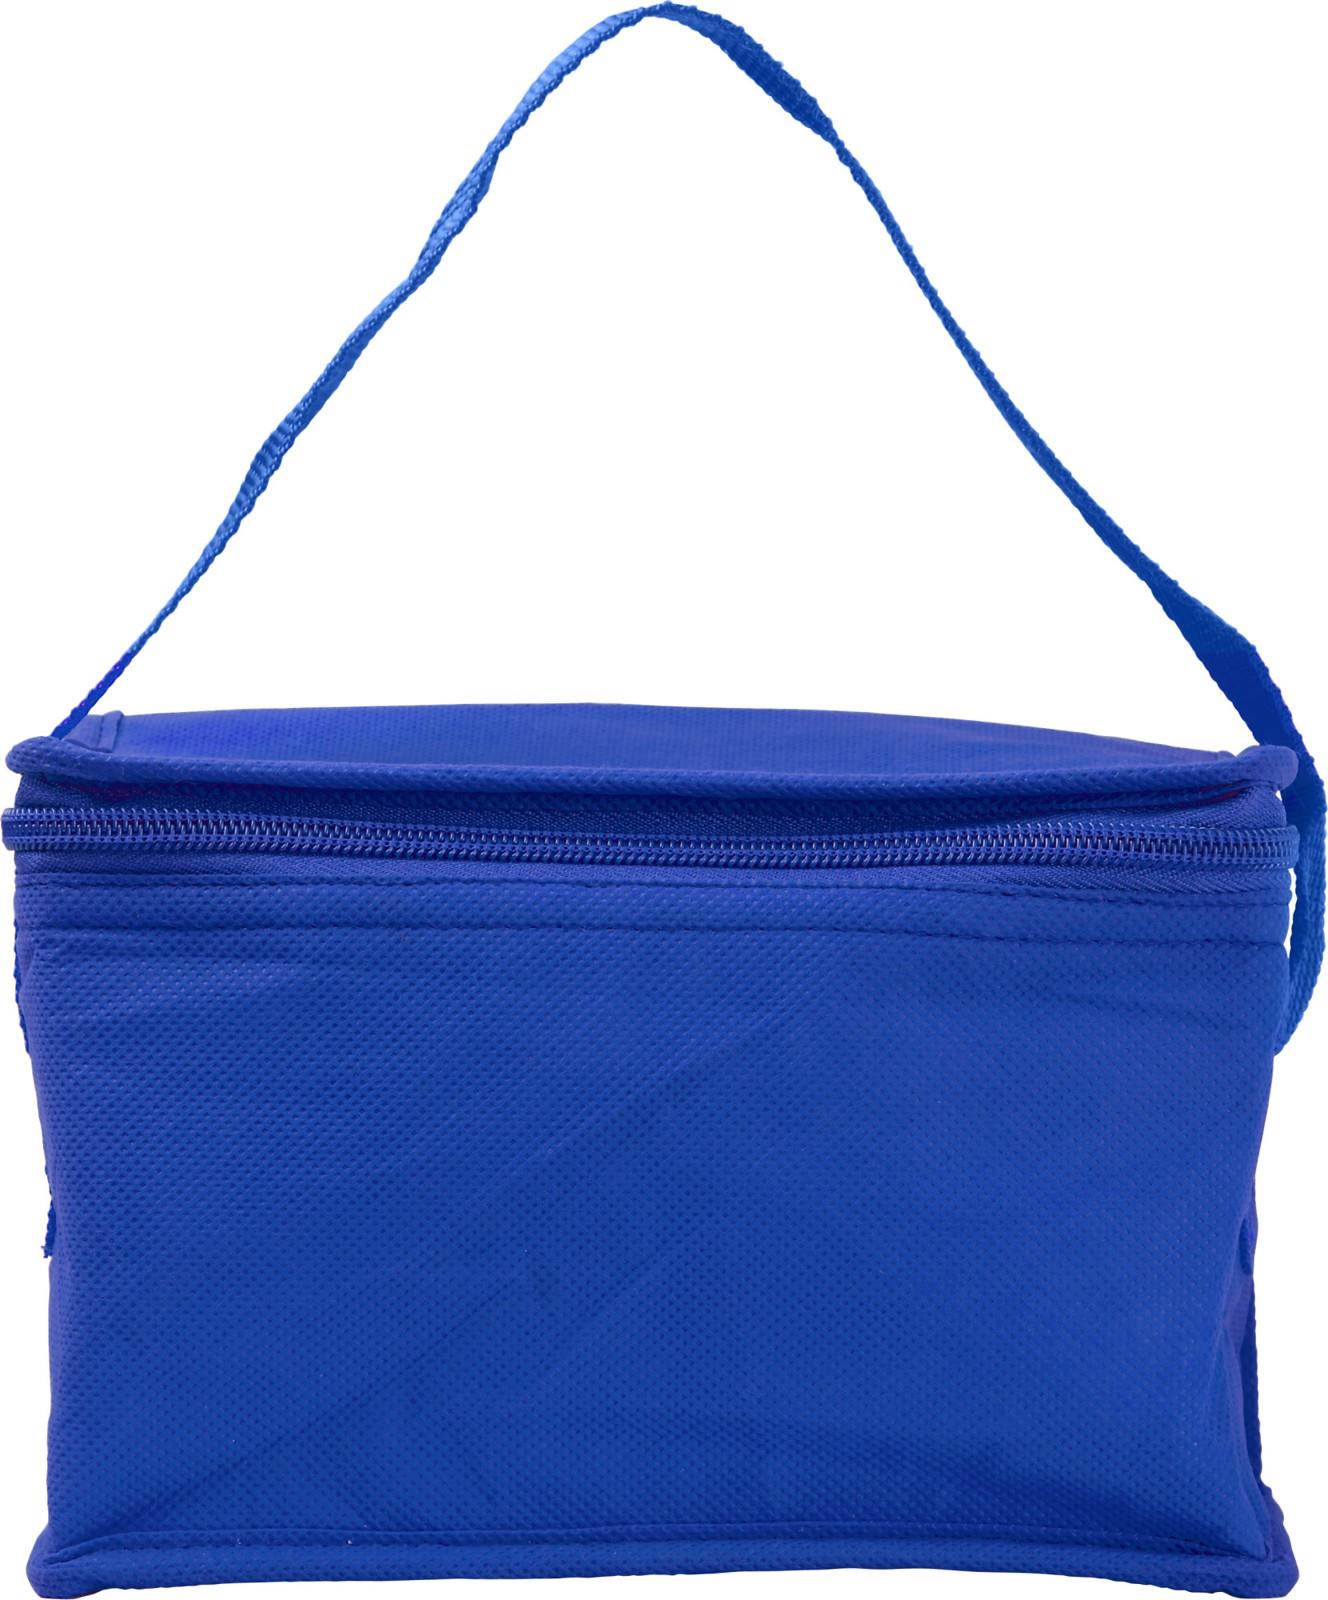 Nonwoven (80 gr/m²) cooler bag - Cobalt Blue